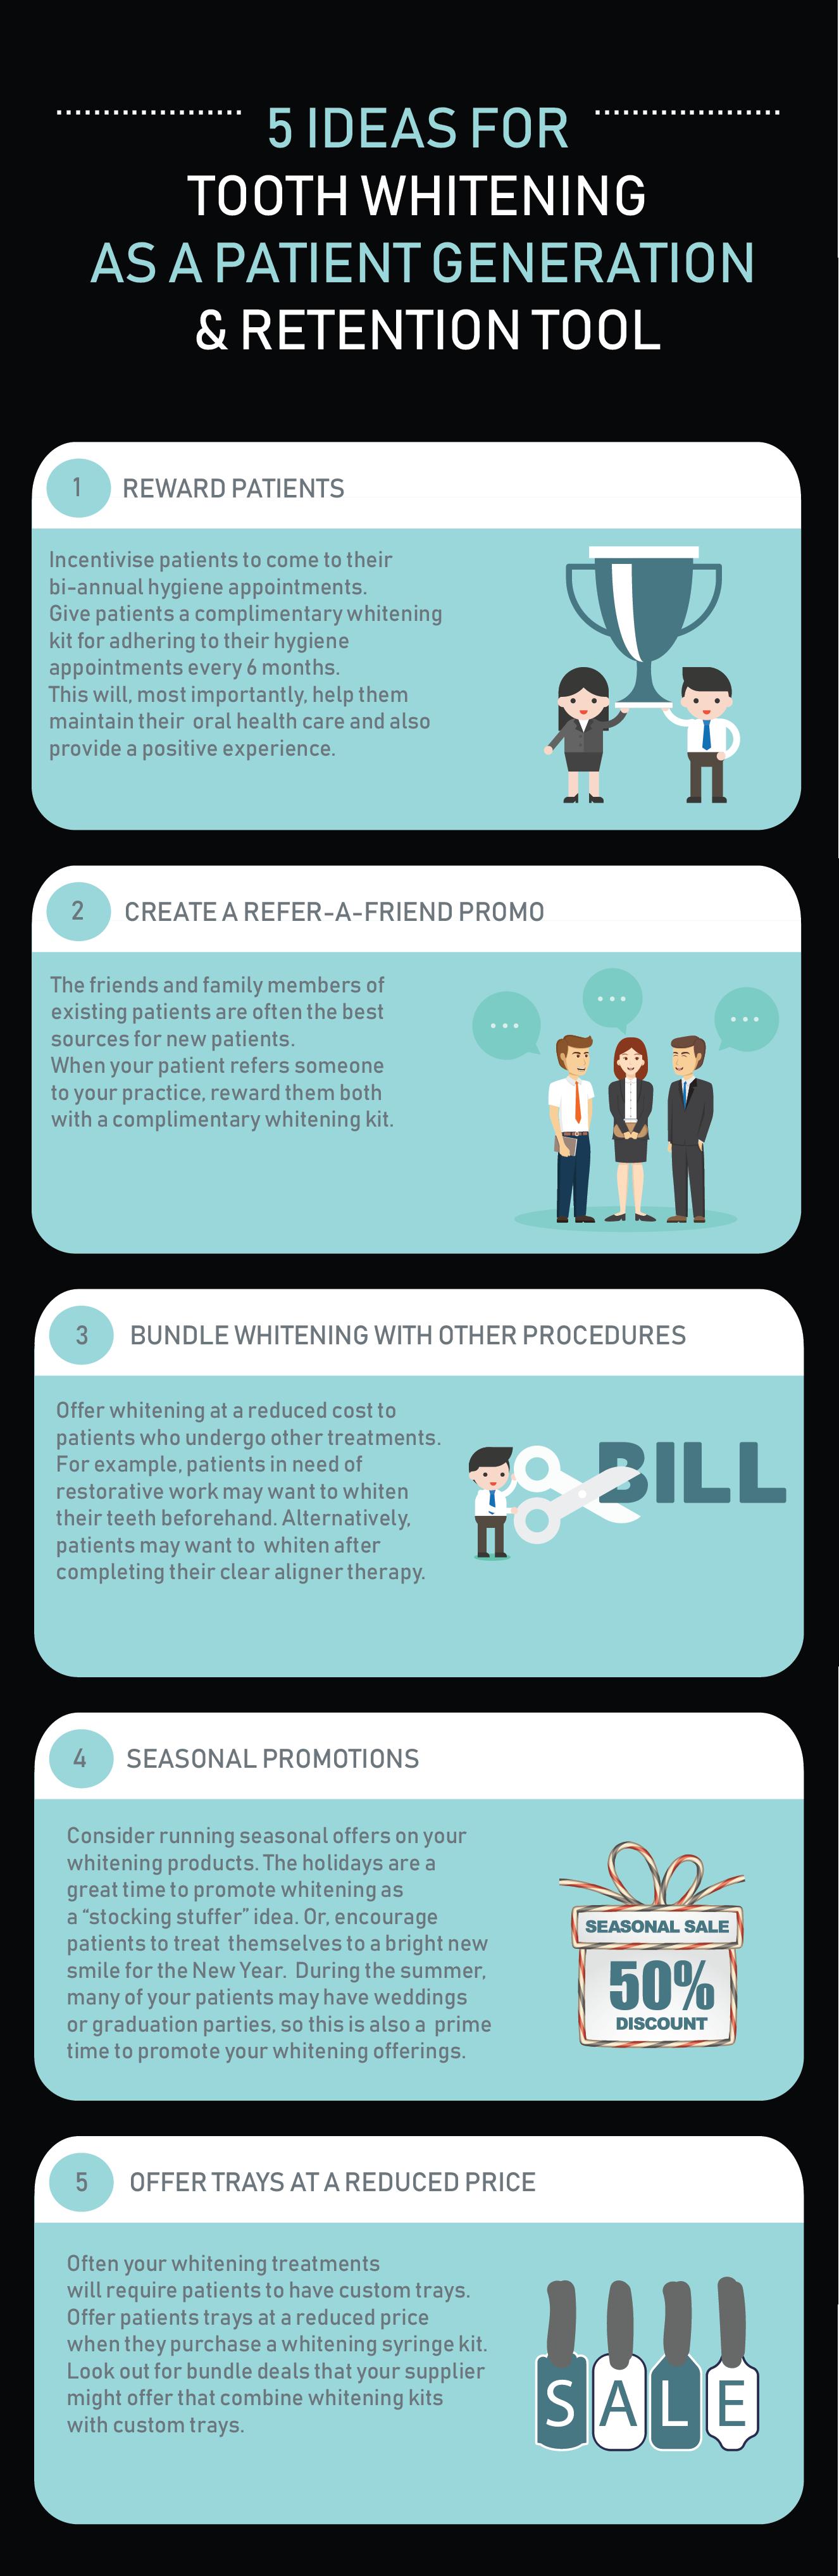 WDB Infographic - 5 ideas for patient retention